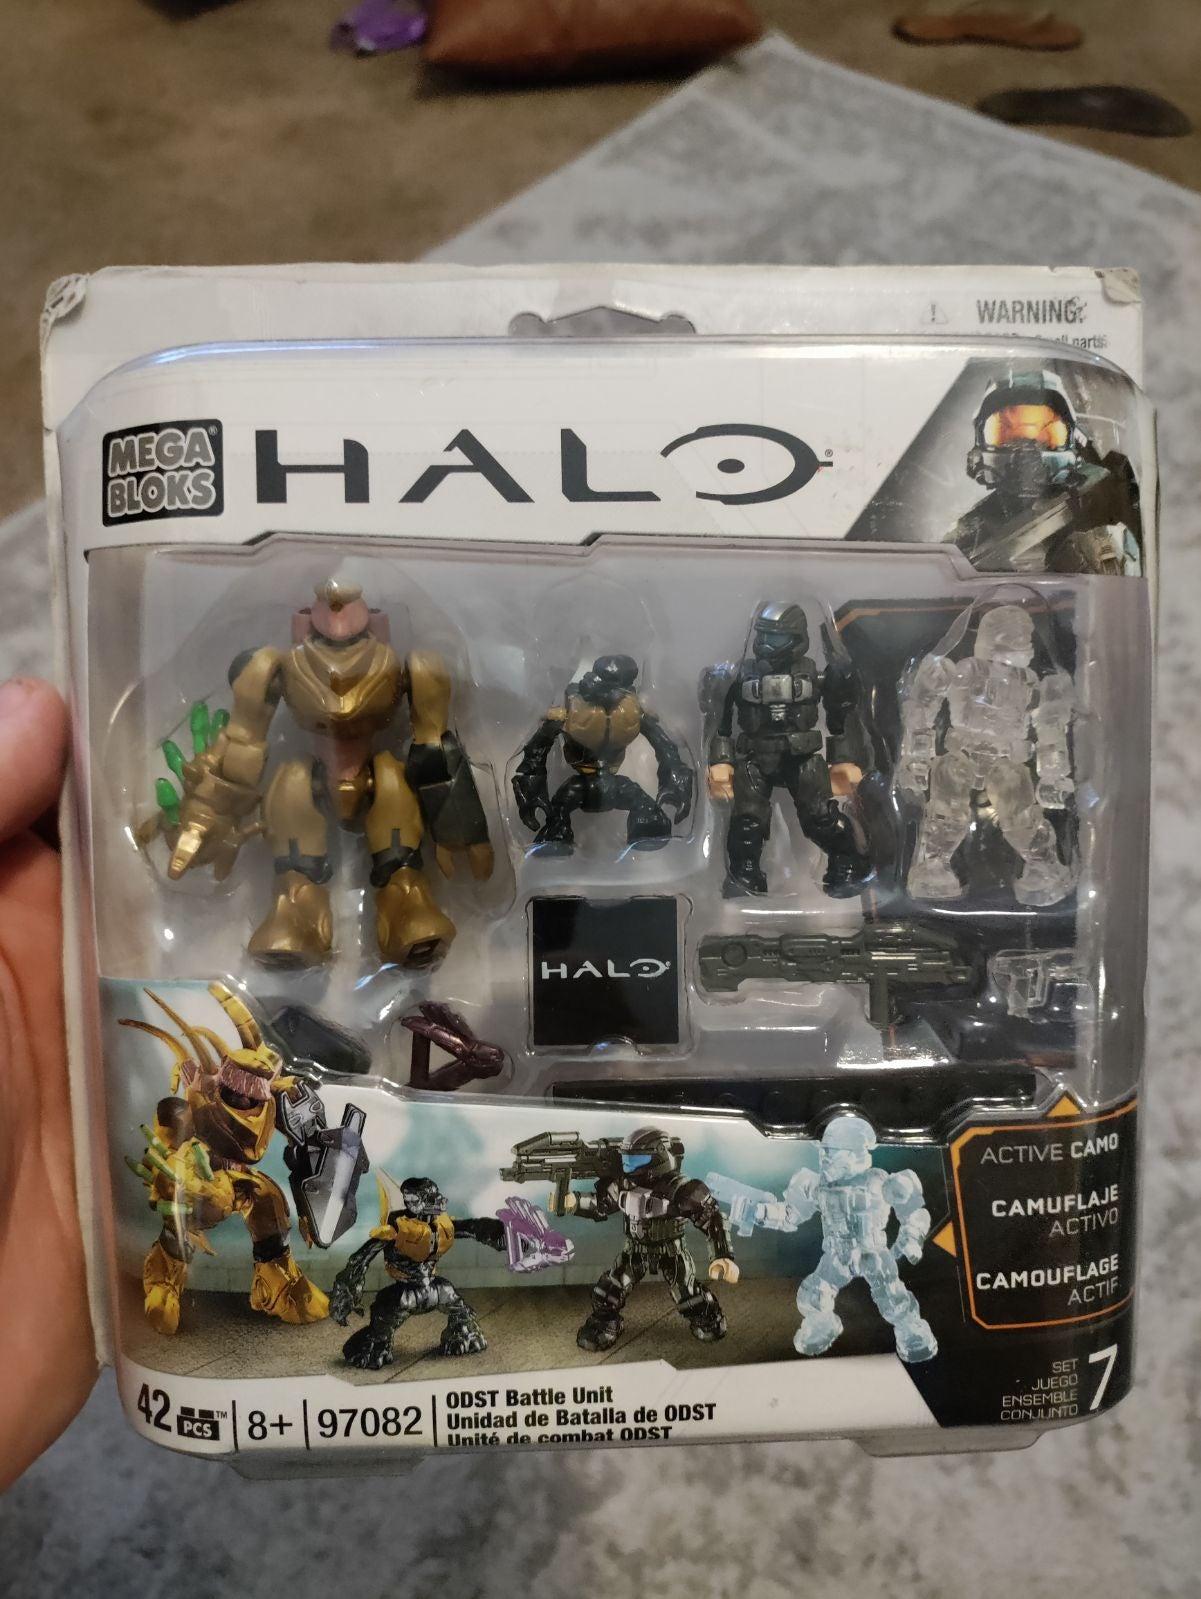 Halo Mega Bloks ODST Battle Unit